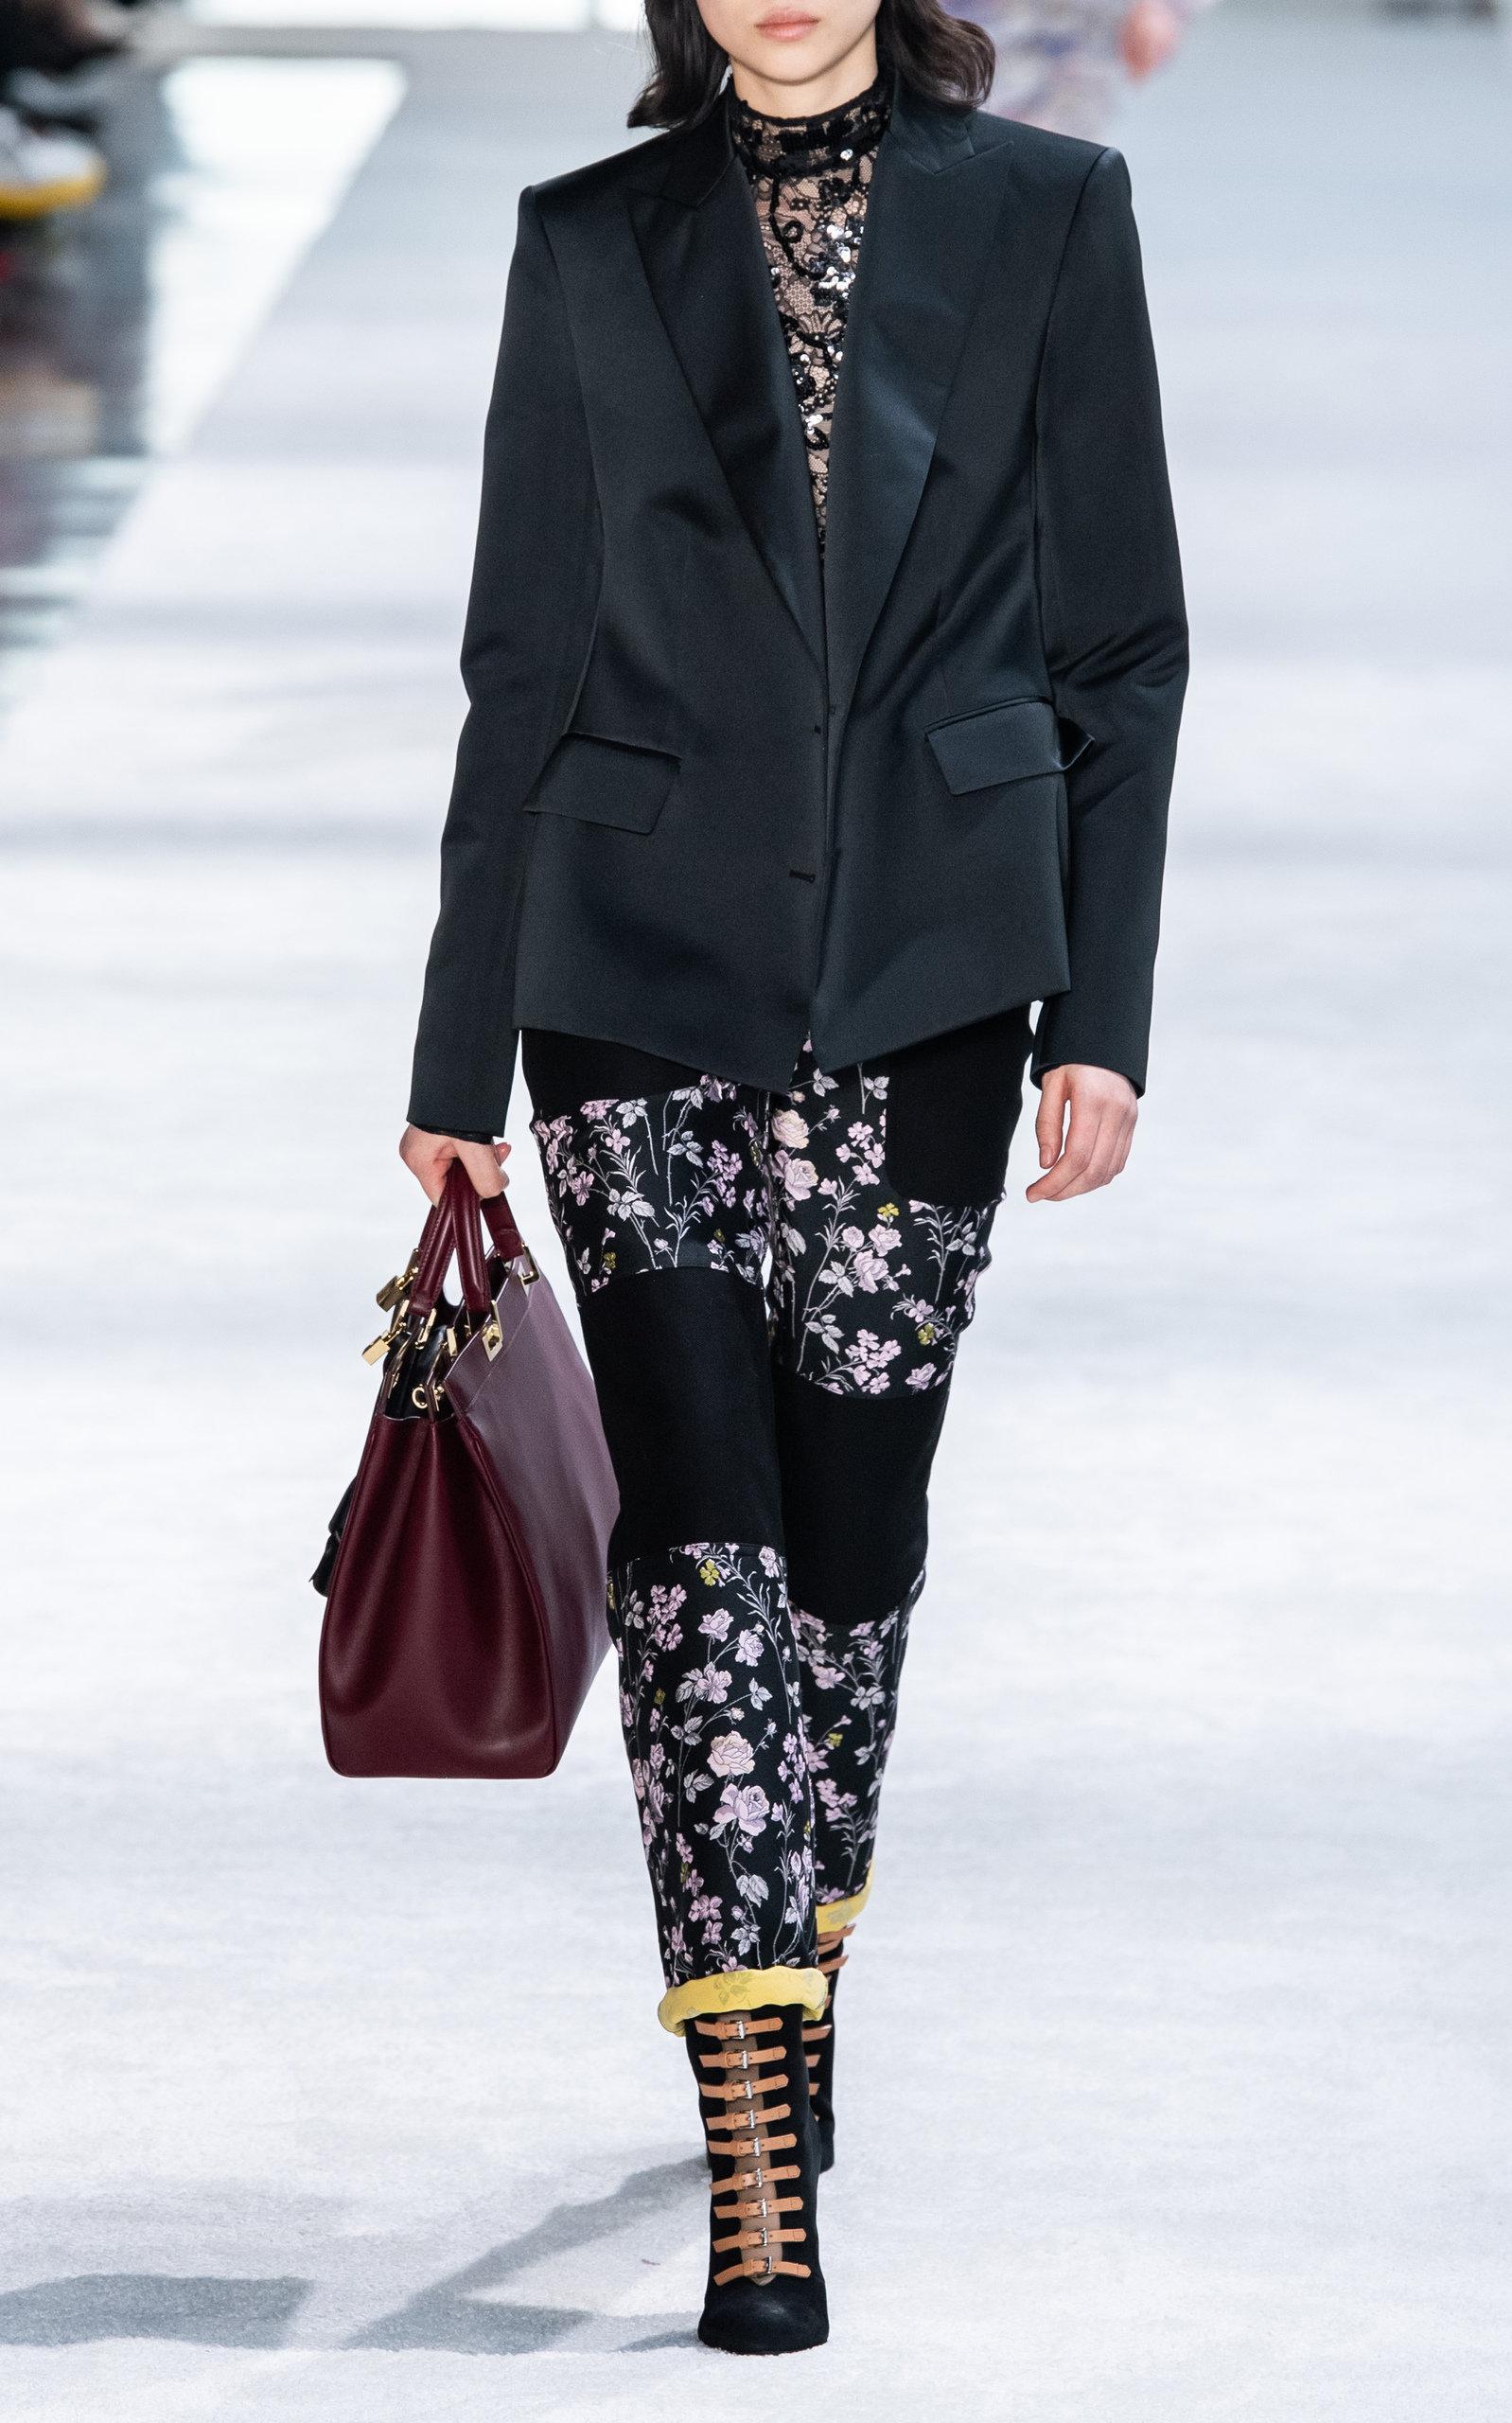 17c8b2d5cef3 Lyst - Giambattista Valli Floral-paneled Straight-leg Pants in Black